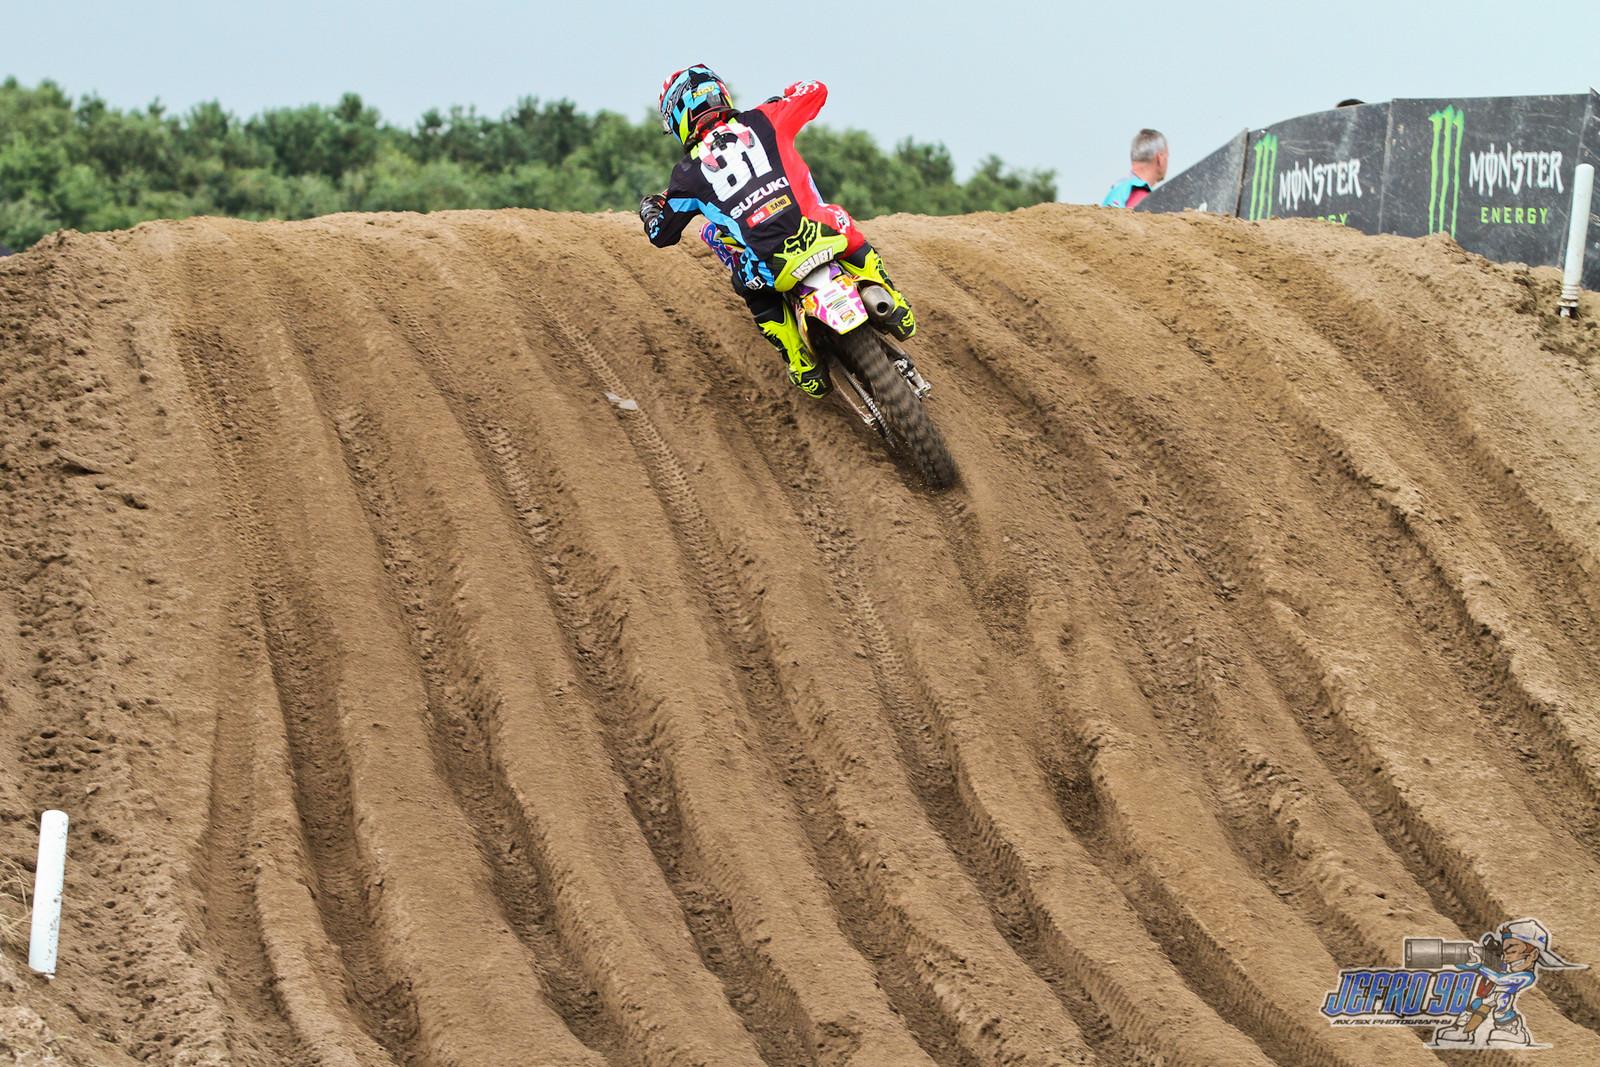 Brian Hsu - Photo Gallery: MXGP of Limburg - Motocross Pictures - Vital MX